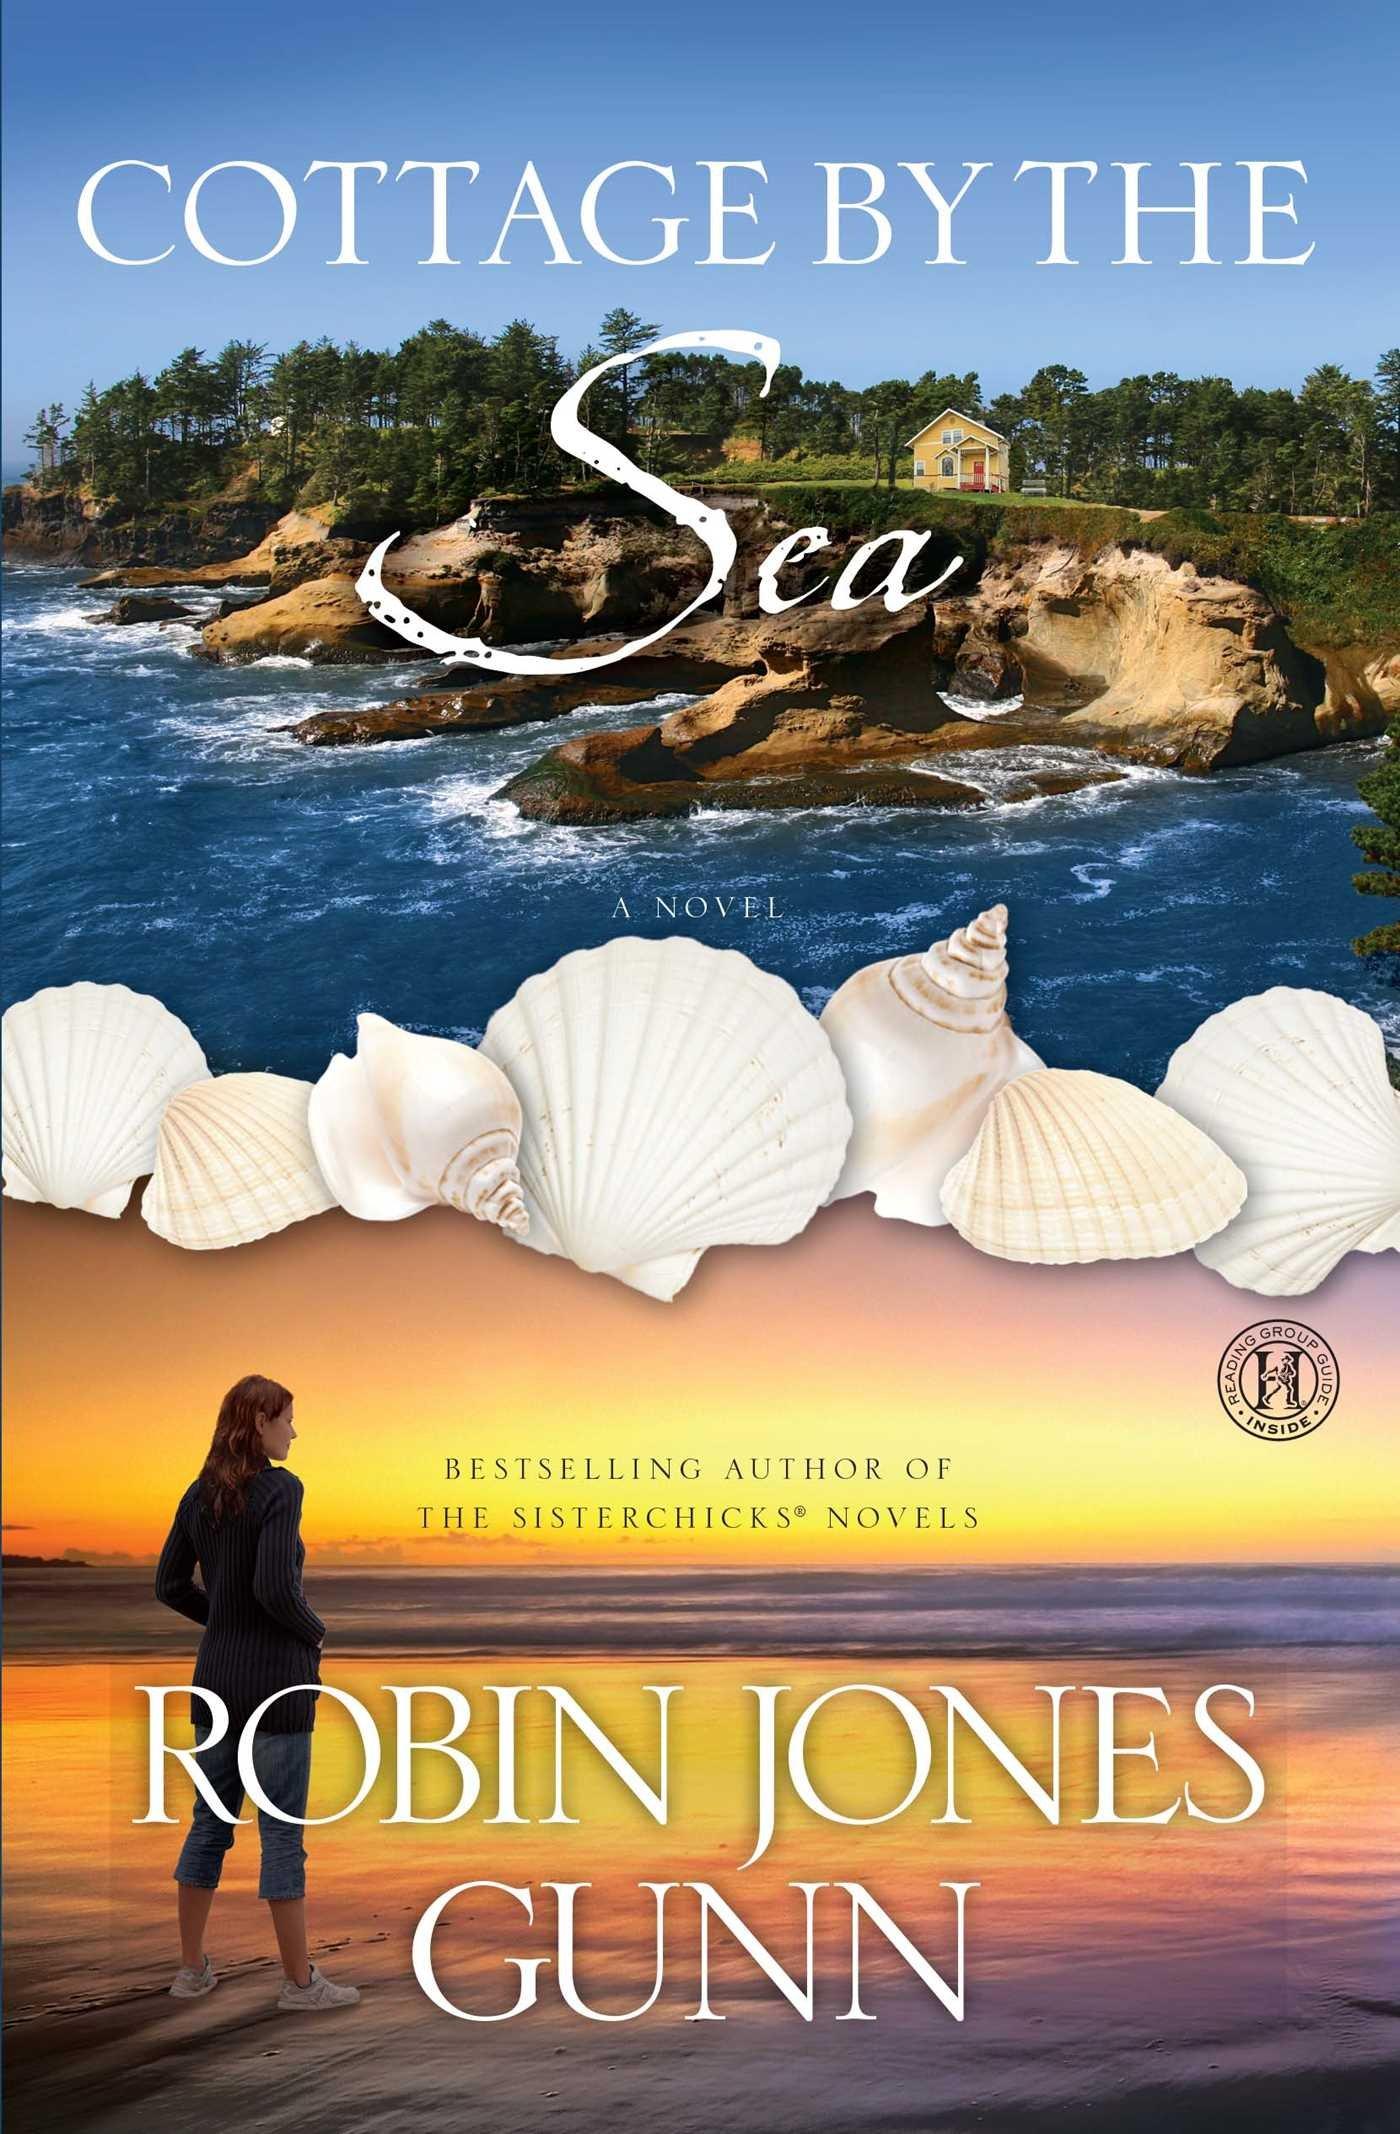 Cottage By The Sea (hideaway): Robin Jones Gunn: 9781416583455: Amazon:  Books